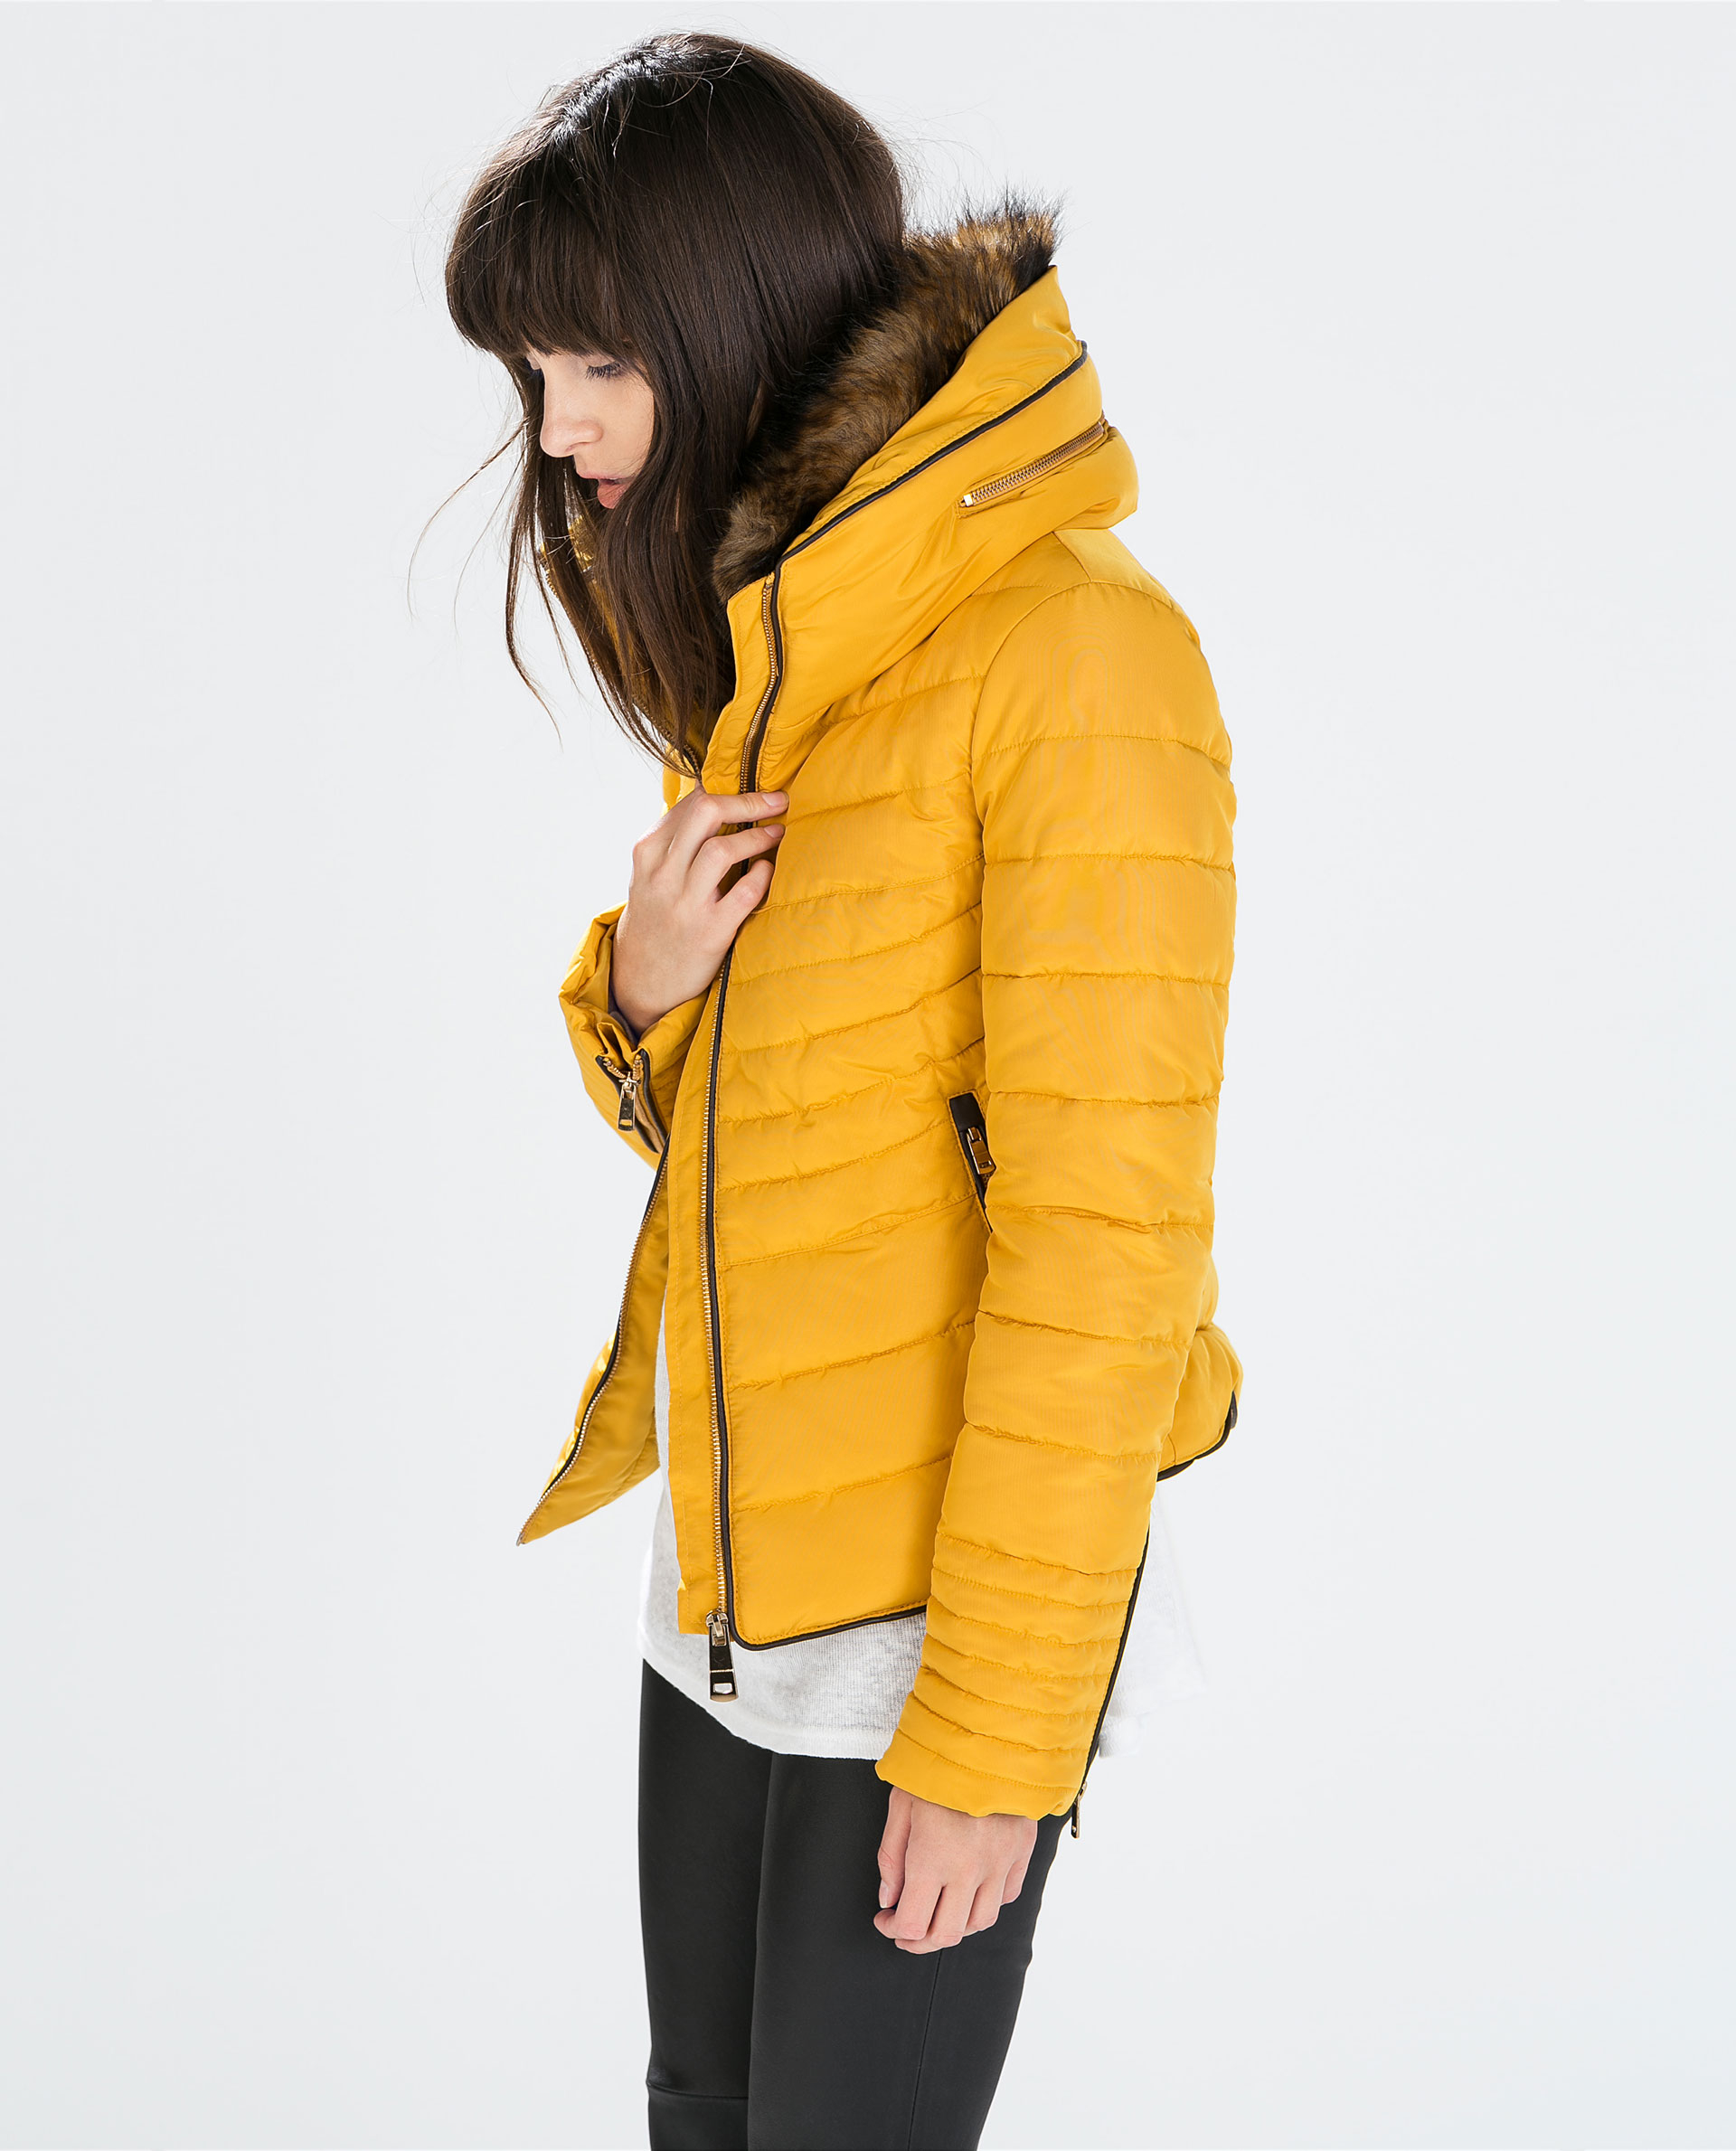 Zara Short Anorak With Fur Collar in Yellow | Lyst